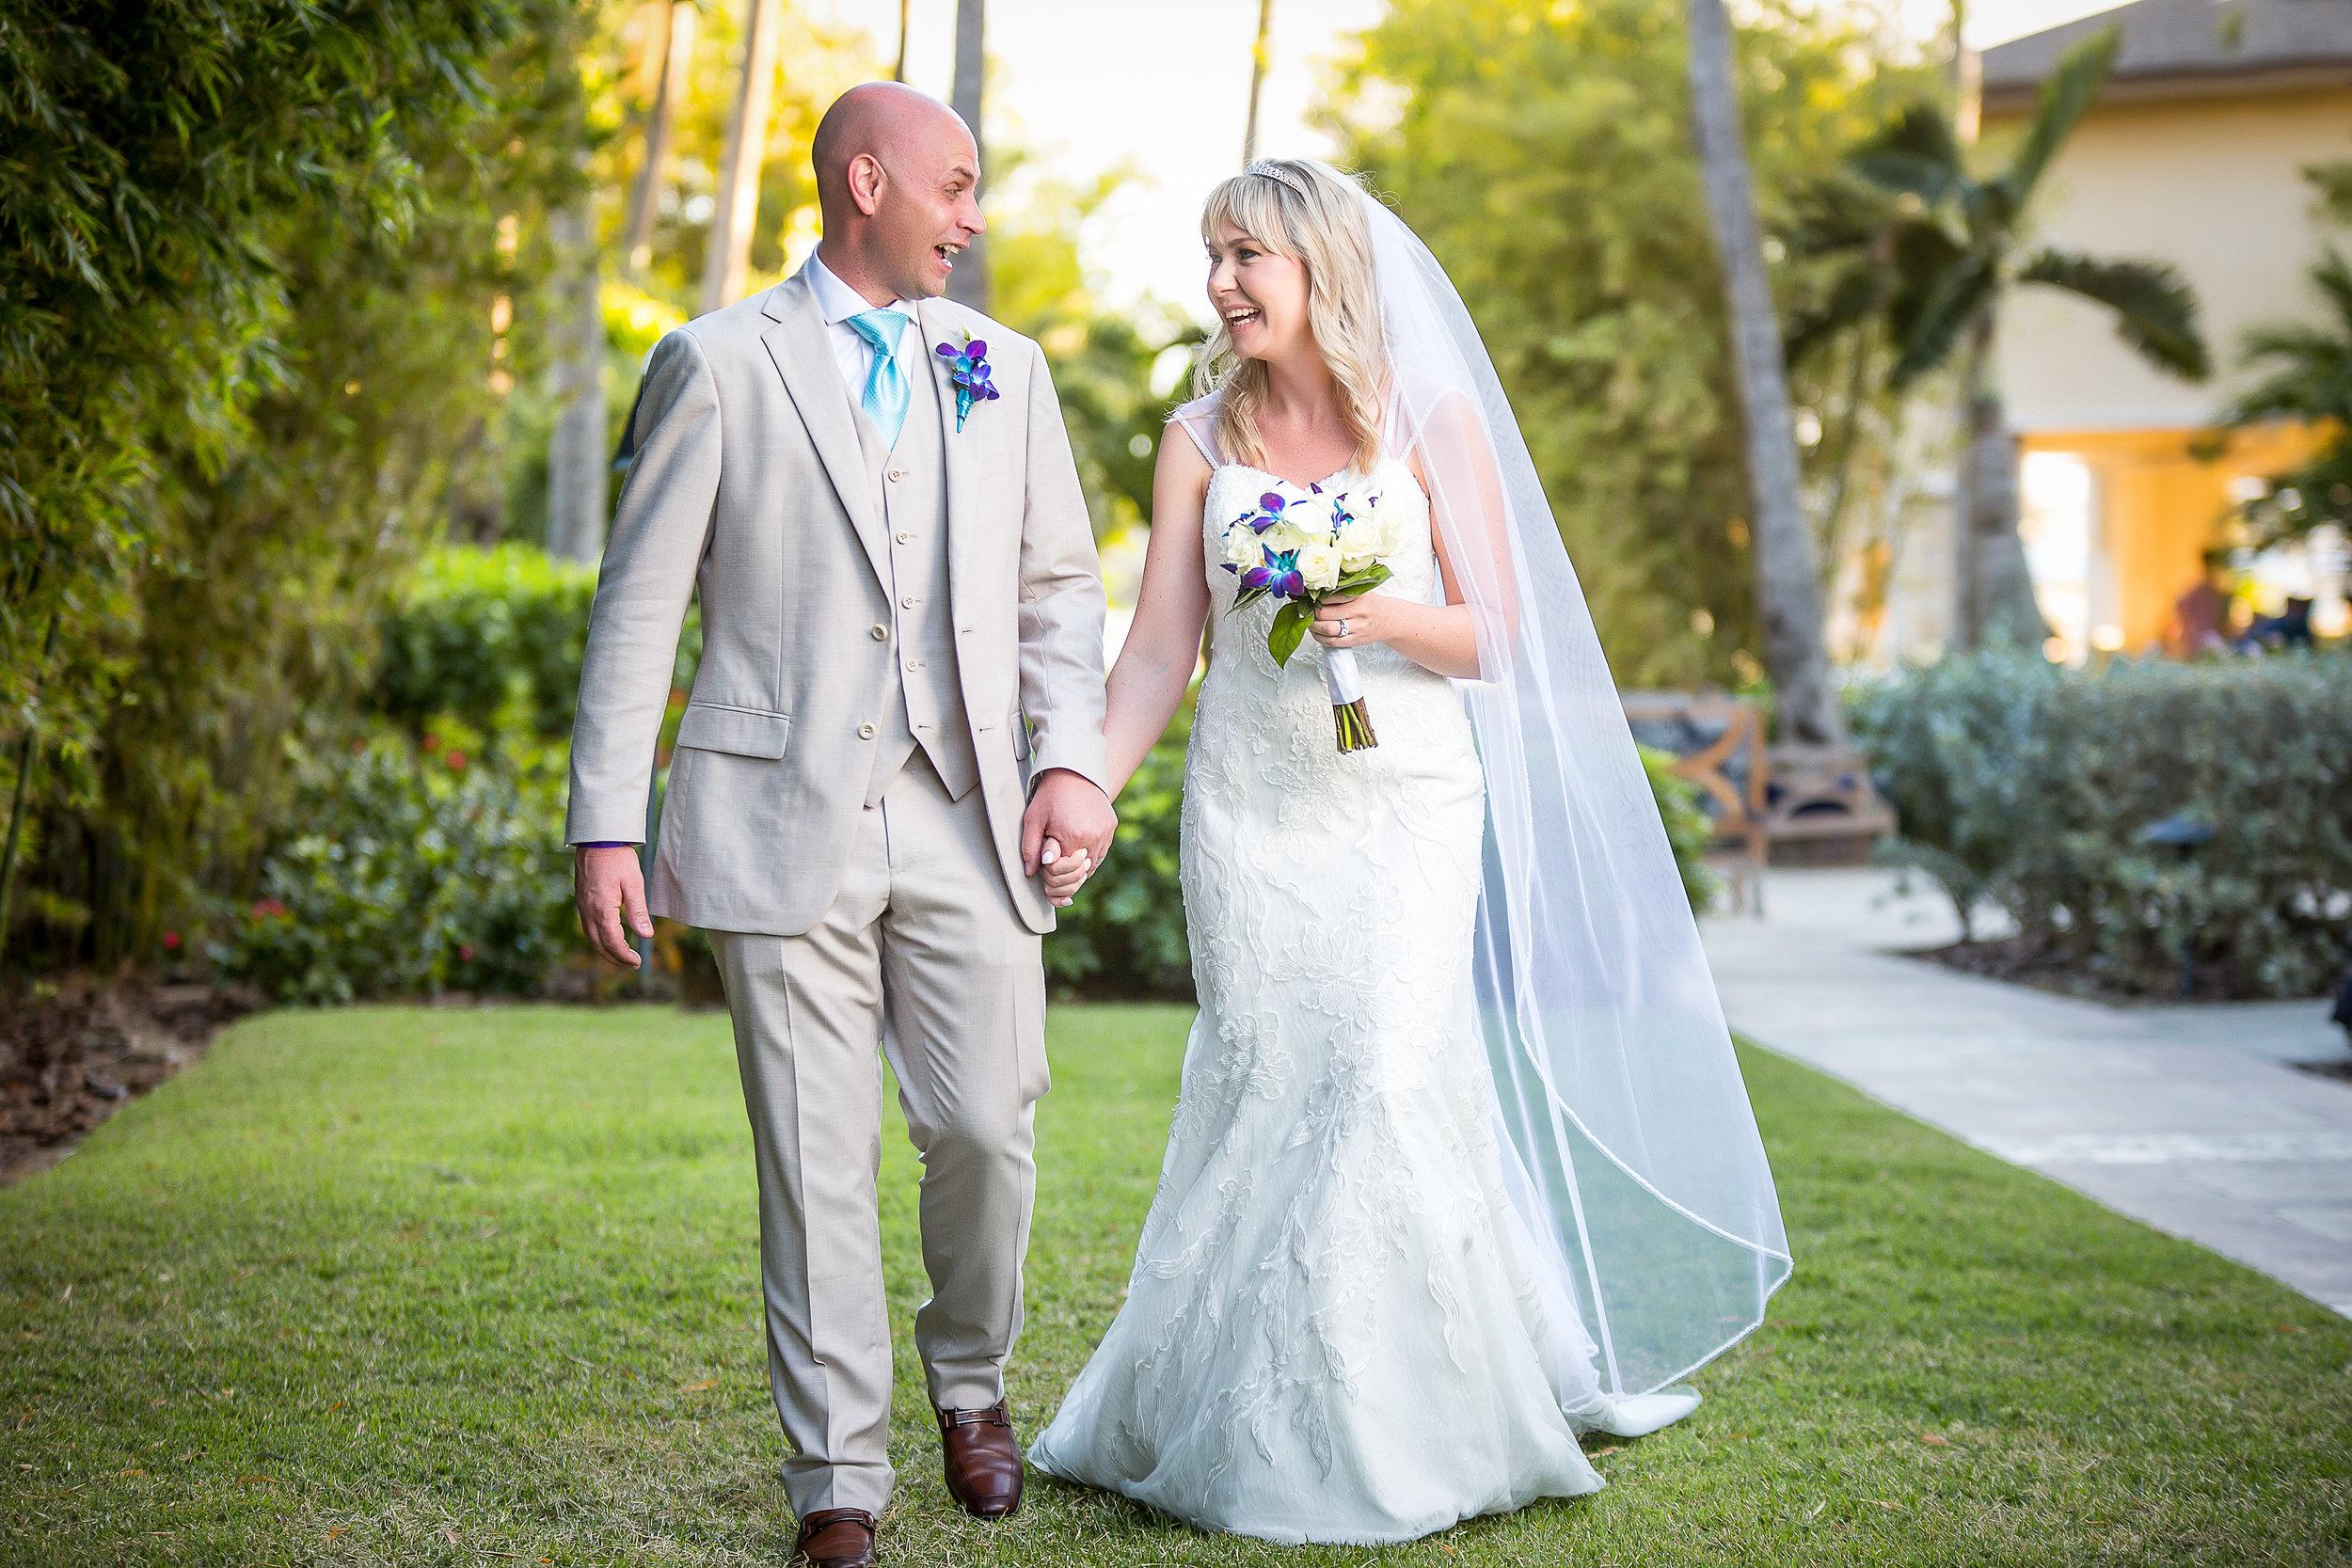 Destination Wedding @ Warwick, Paradise Island, The Bahamas 2019